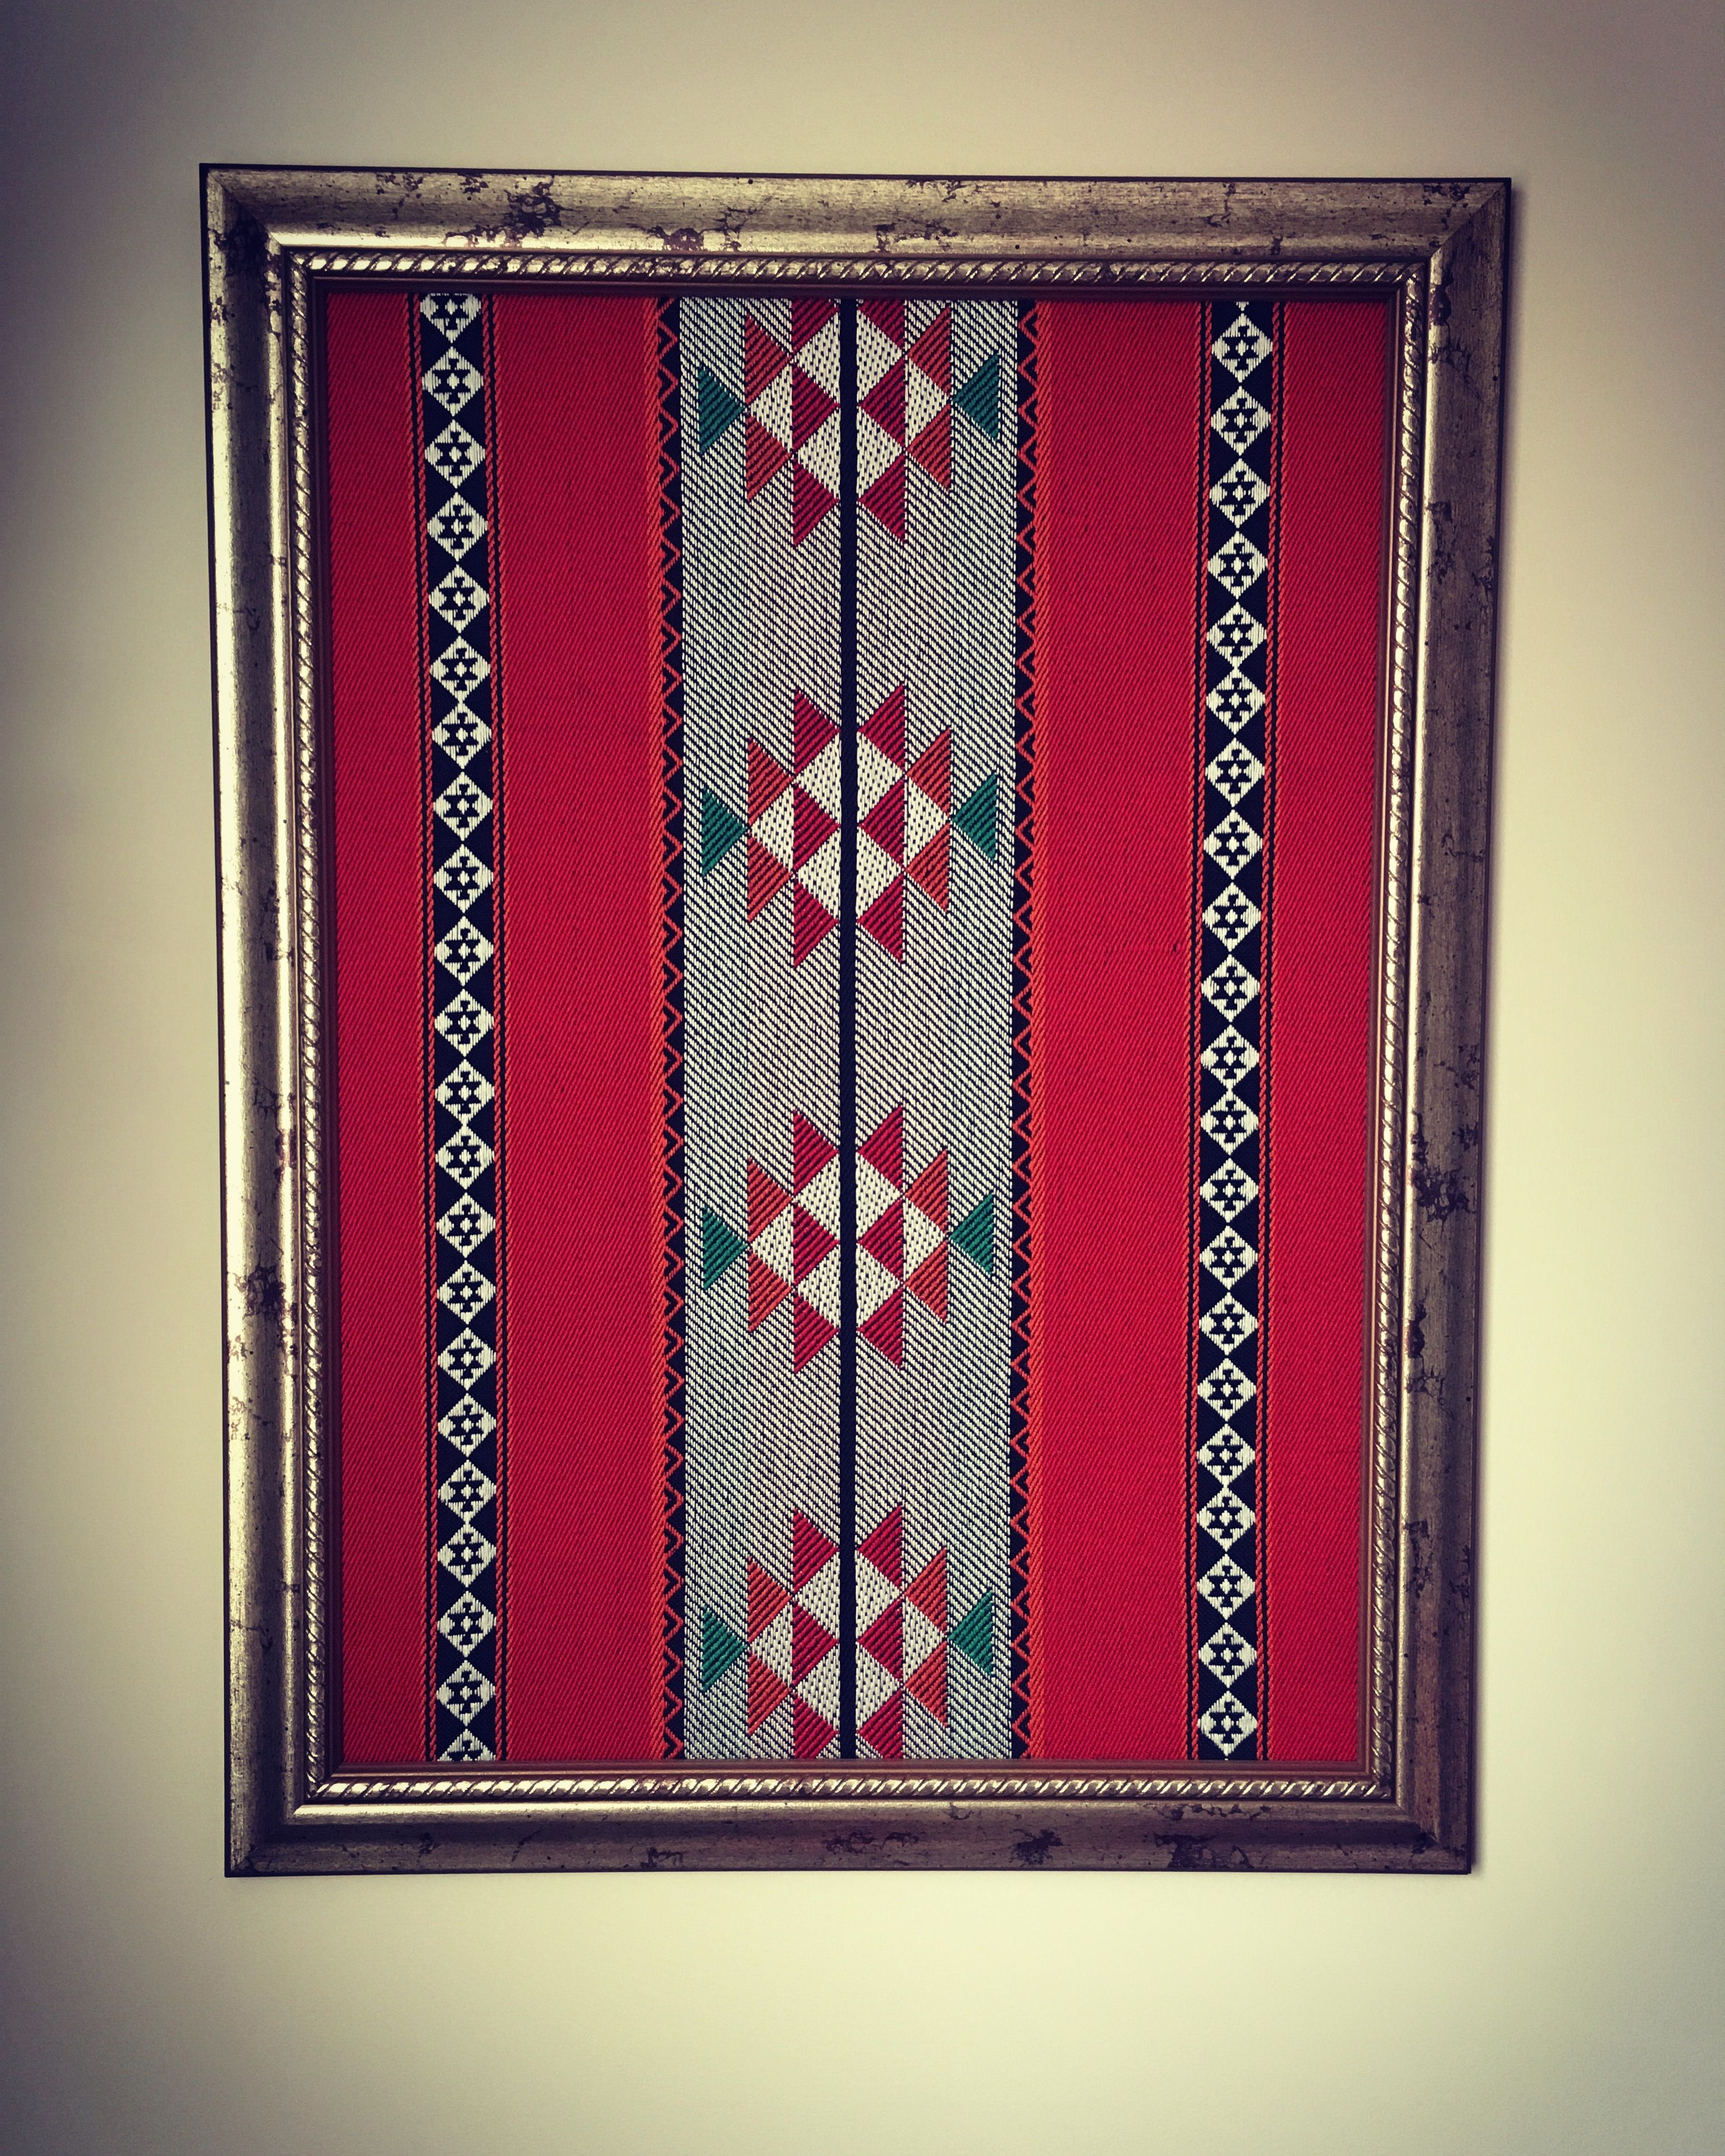 Elegant picture frame from the Sadu fabric. برواز أنيق من قماش السدو